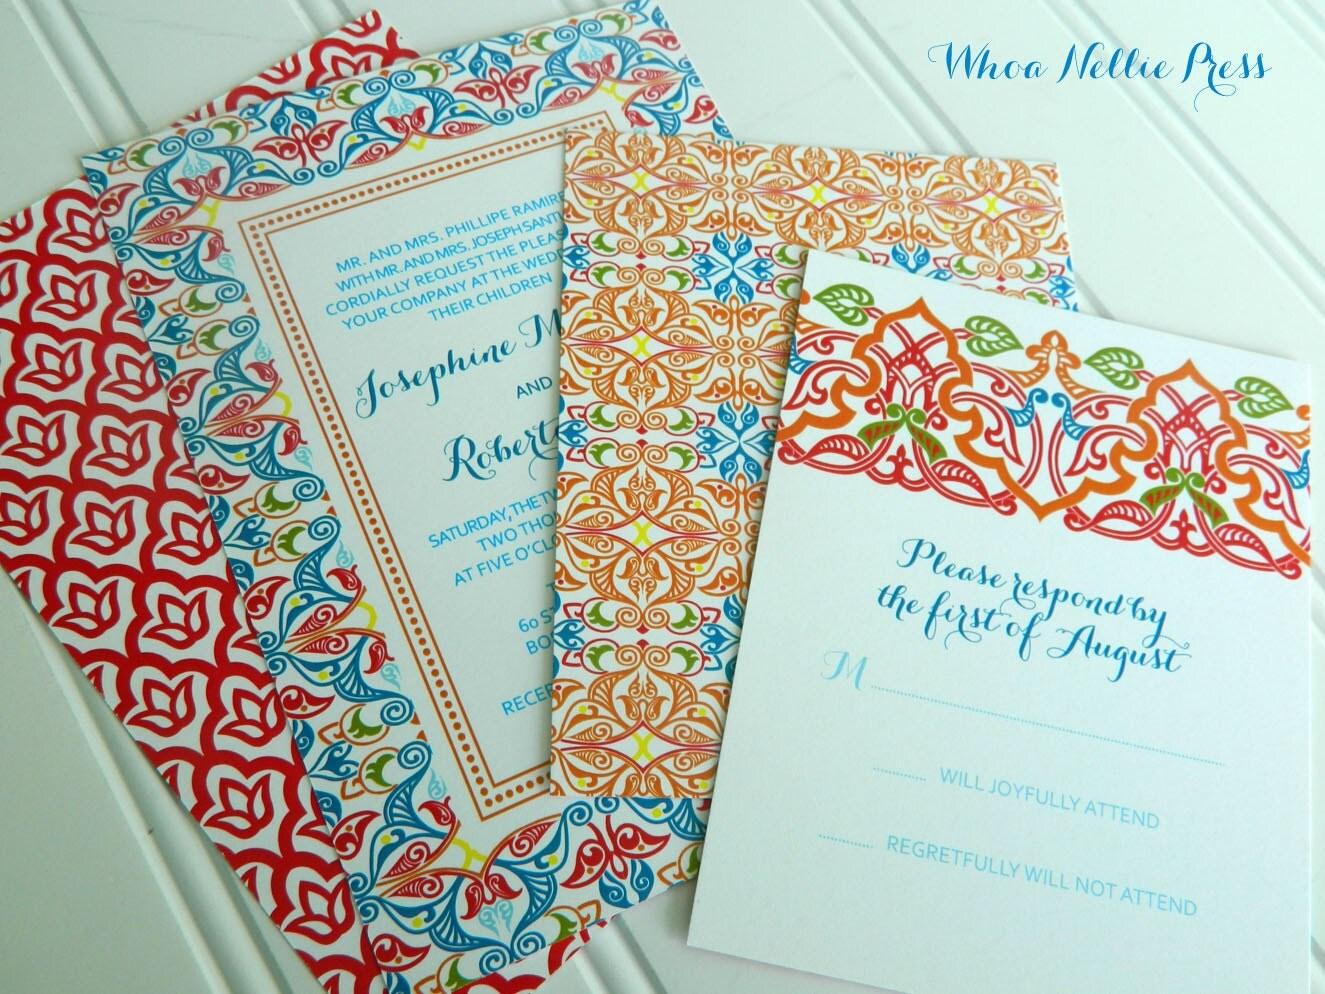 Wedding Invitation In Spanish Wording: Spanish Tiles Wedding Invitations